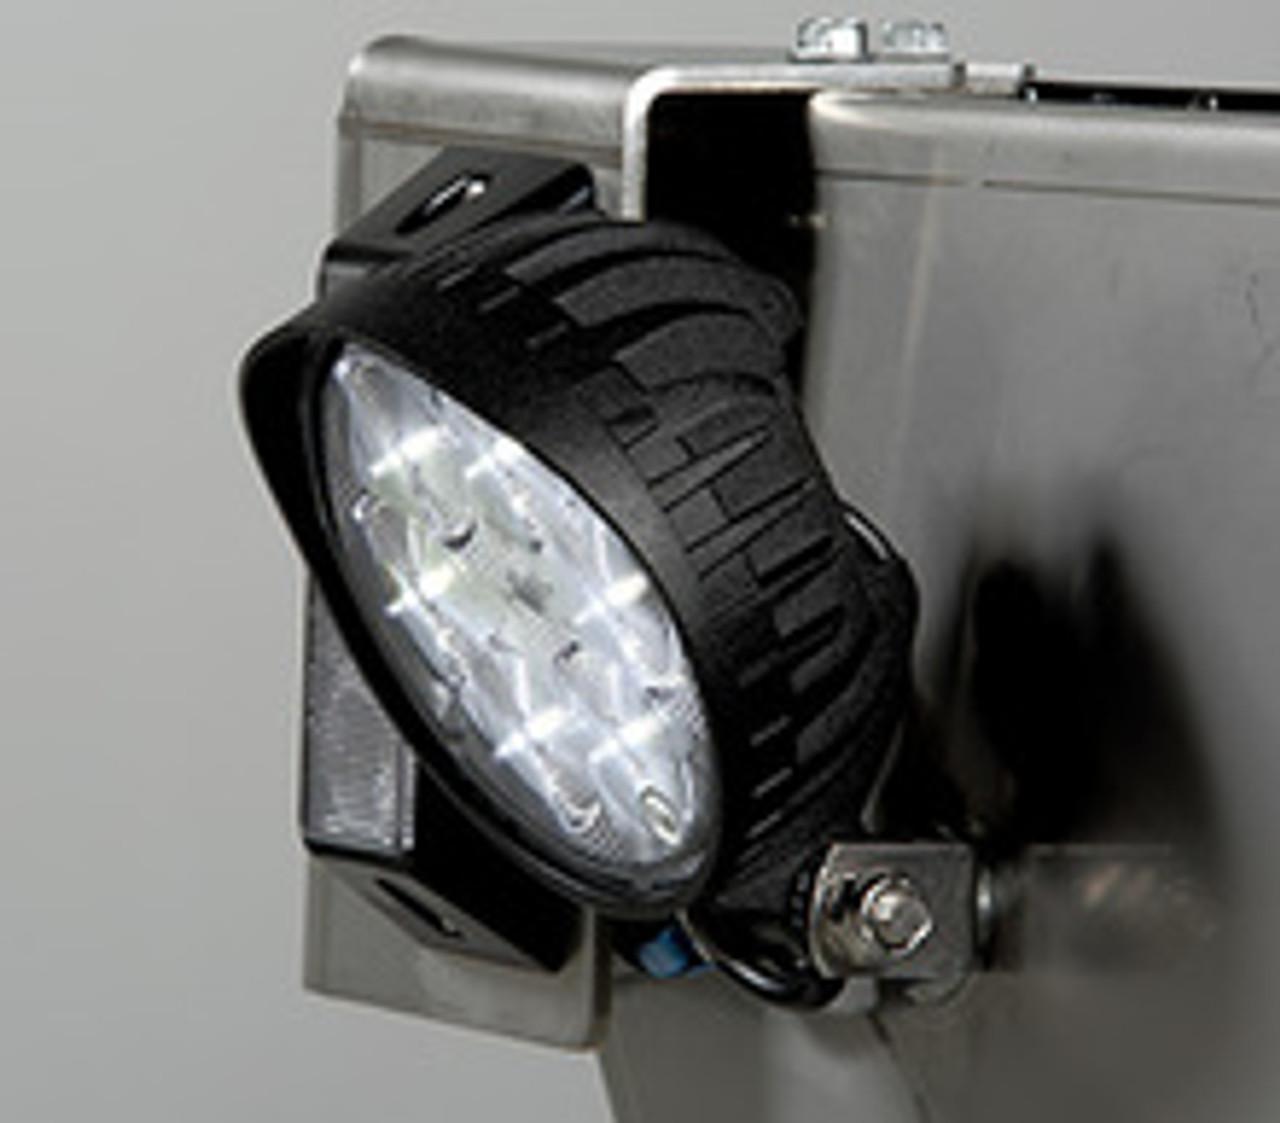 99505-1 FISHER GENUINE SPREADER ACCESSORY - PRIMARY  WORK LIGHT KIT - STEEL-CASTER & STRIKER (ELECTRIC) ONLY POLYCASTER & TORNADO FLEETFLEX ONLY